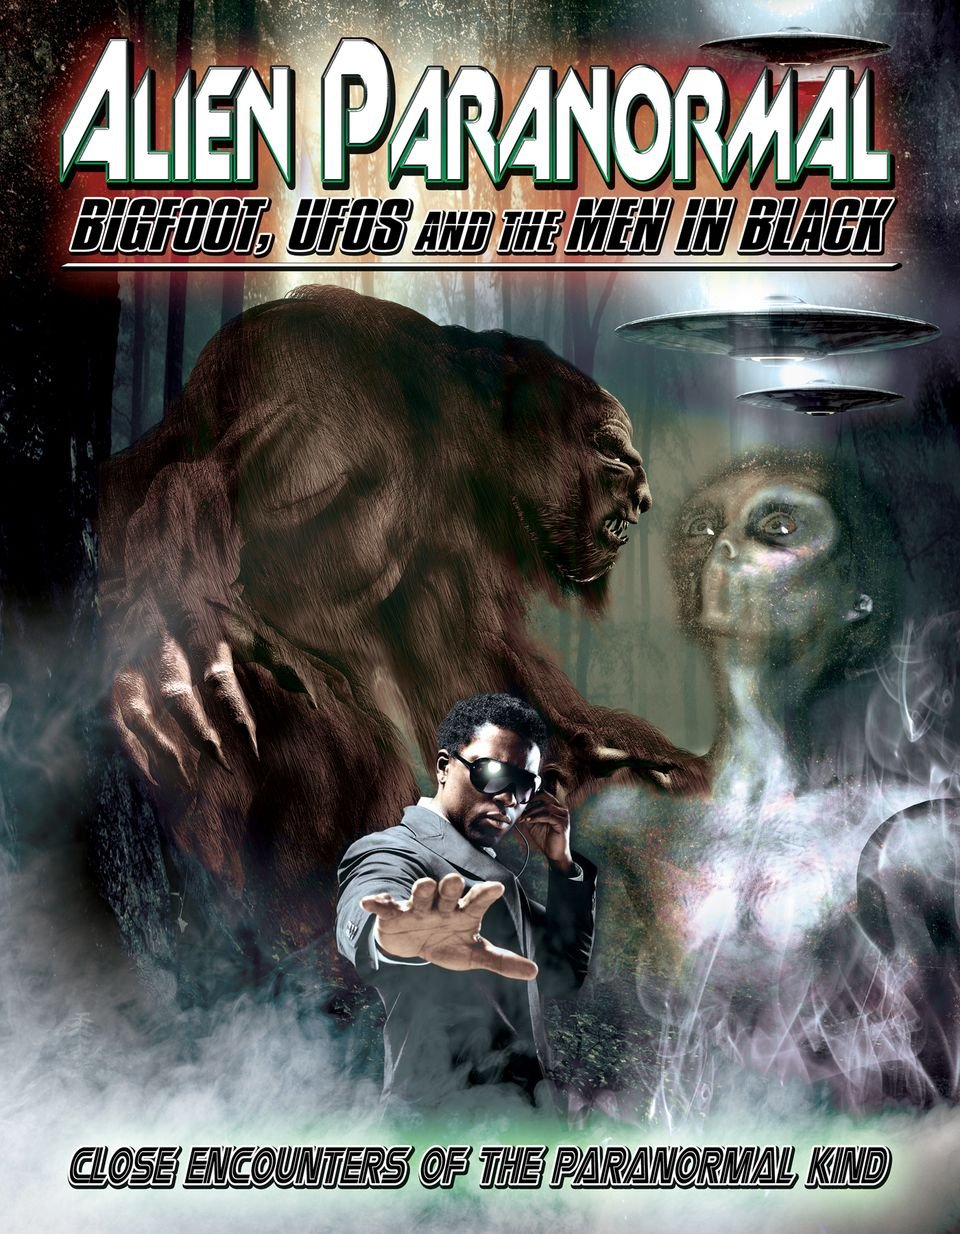 DVD : Amanda Ward - Alien Paranormal: Bigfoot, Ufos And The Men In Black (Full Frame)